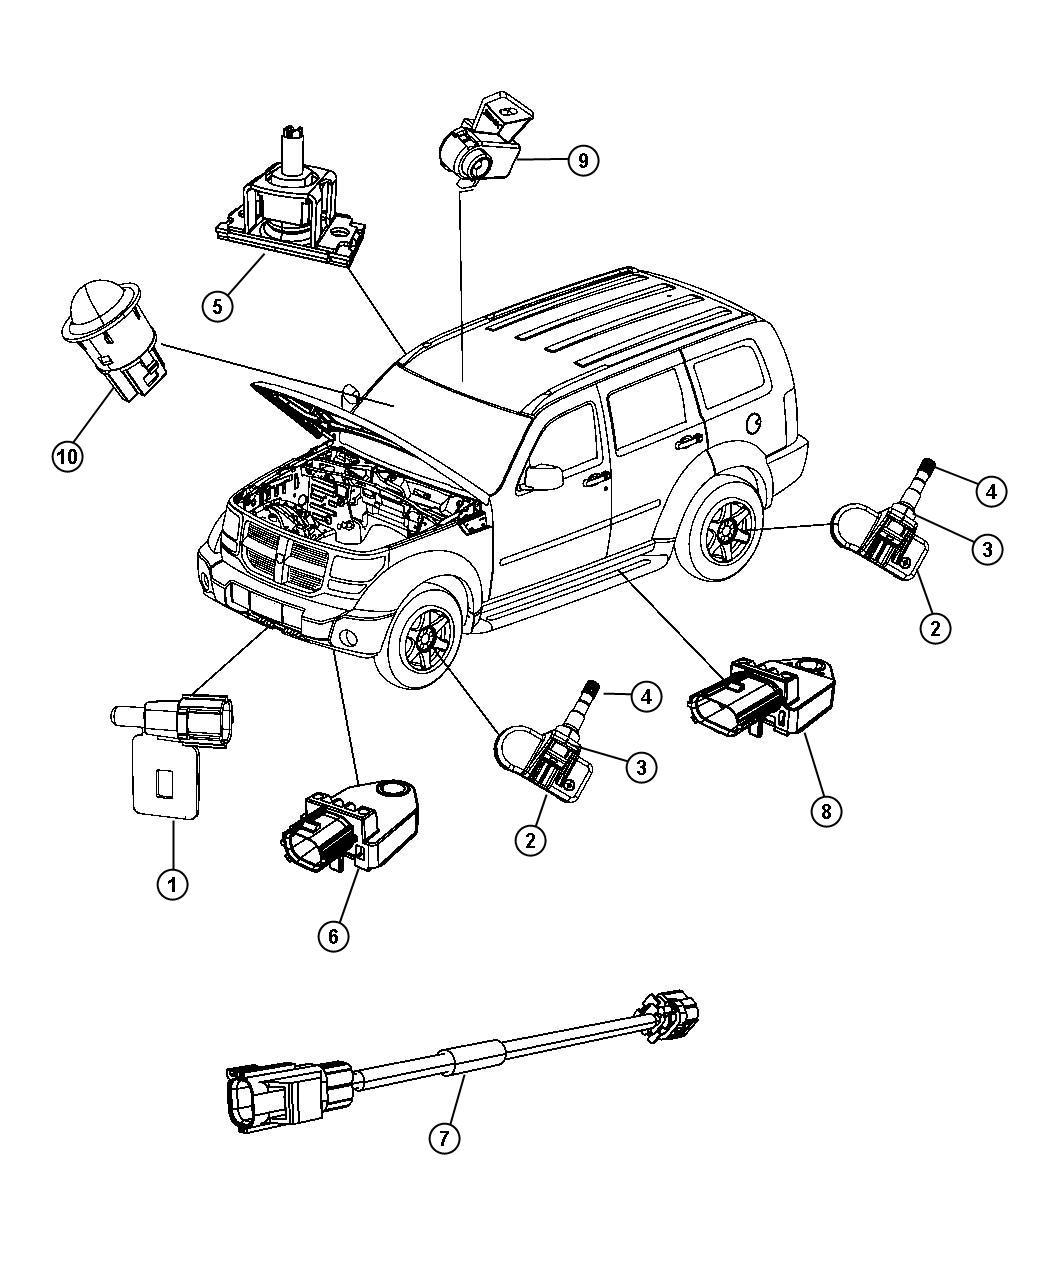 Jeep Liberty Sensor Infrared Trim All Trim Codes